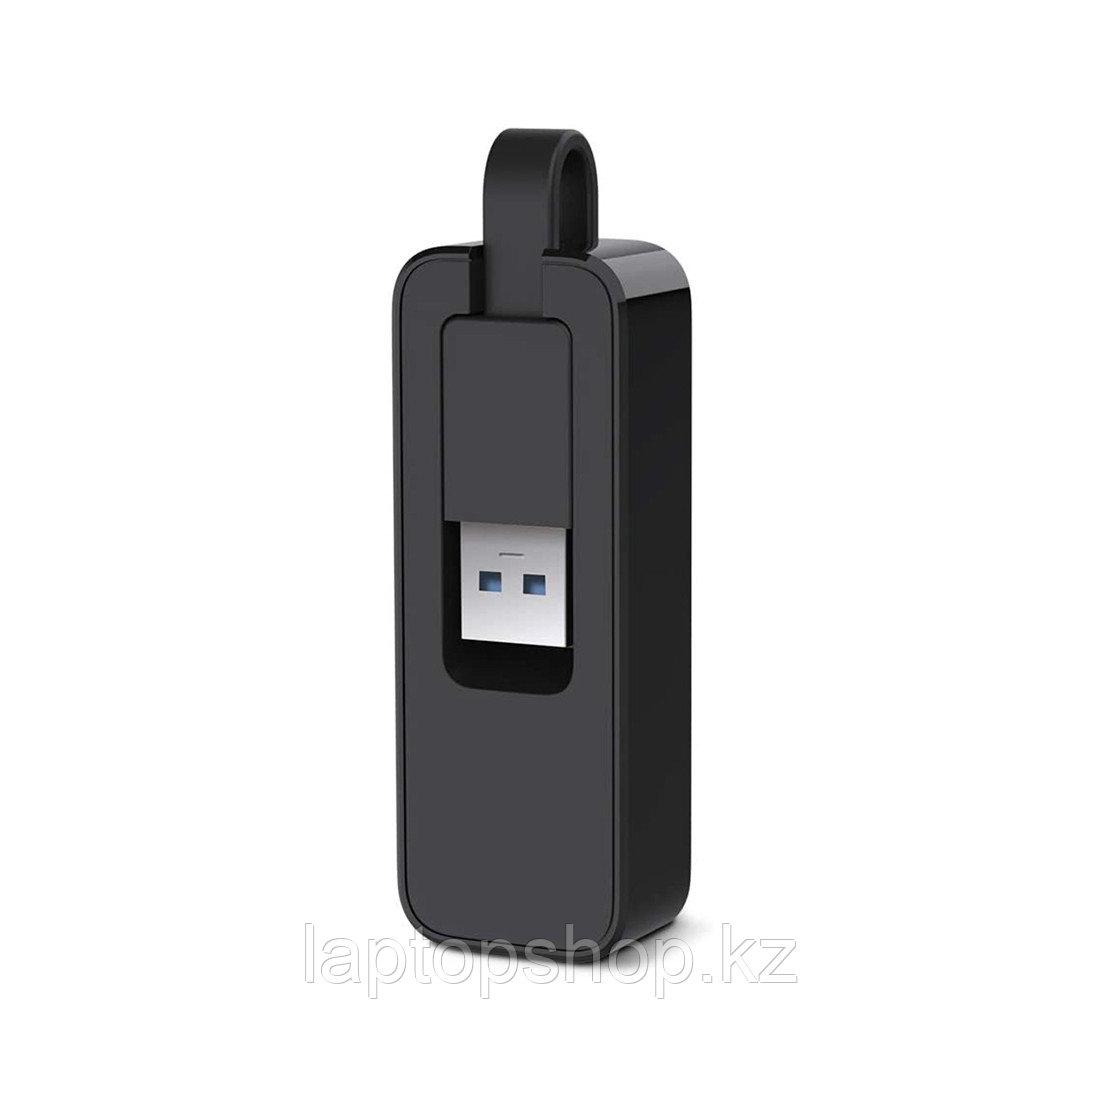 Сетевой адаптер TP-Link UE305